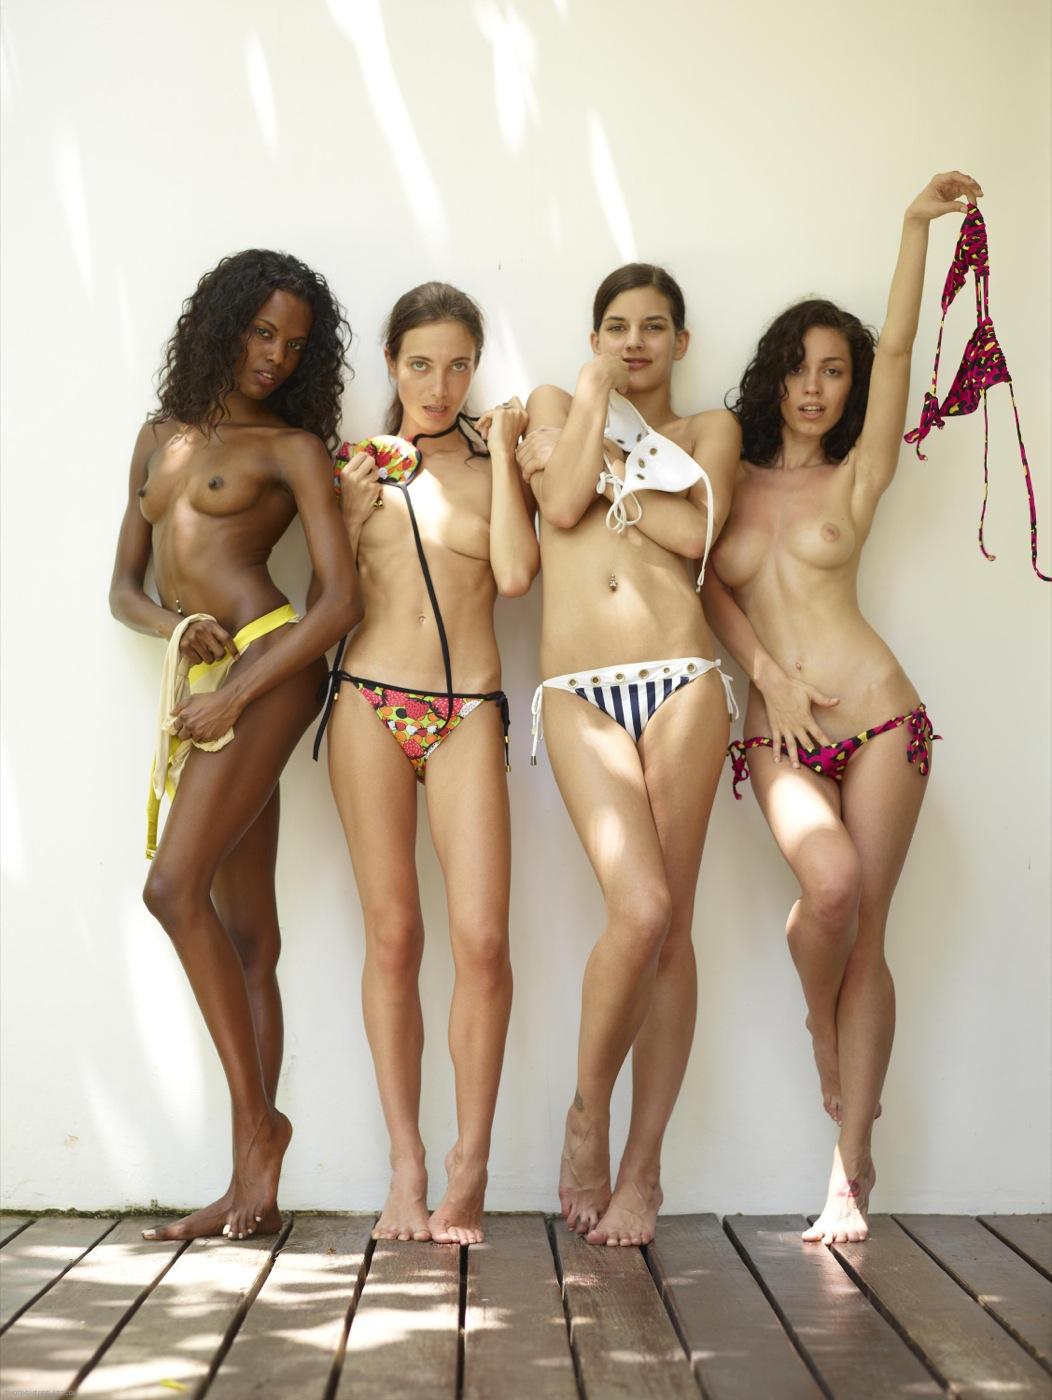 Mujeres Guapas Desnudas Estudiantes Flacas Se Desnudan